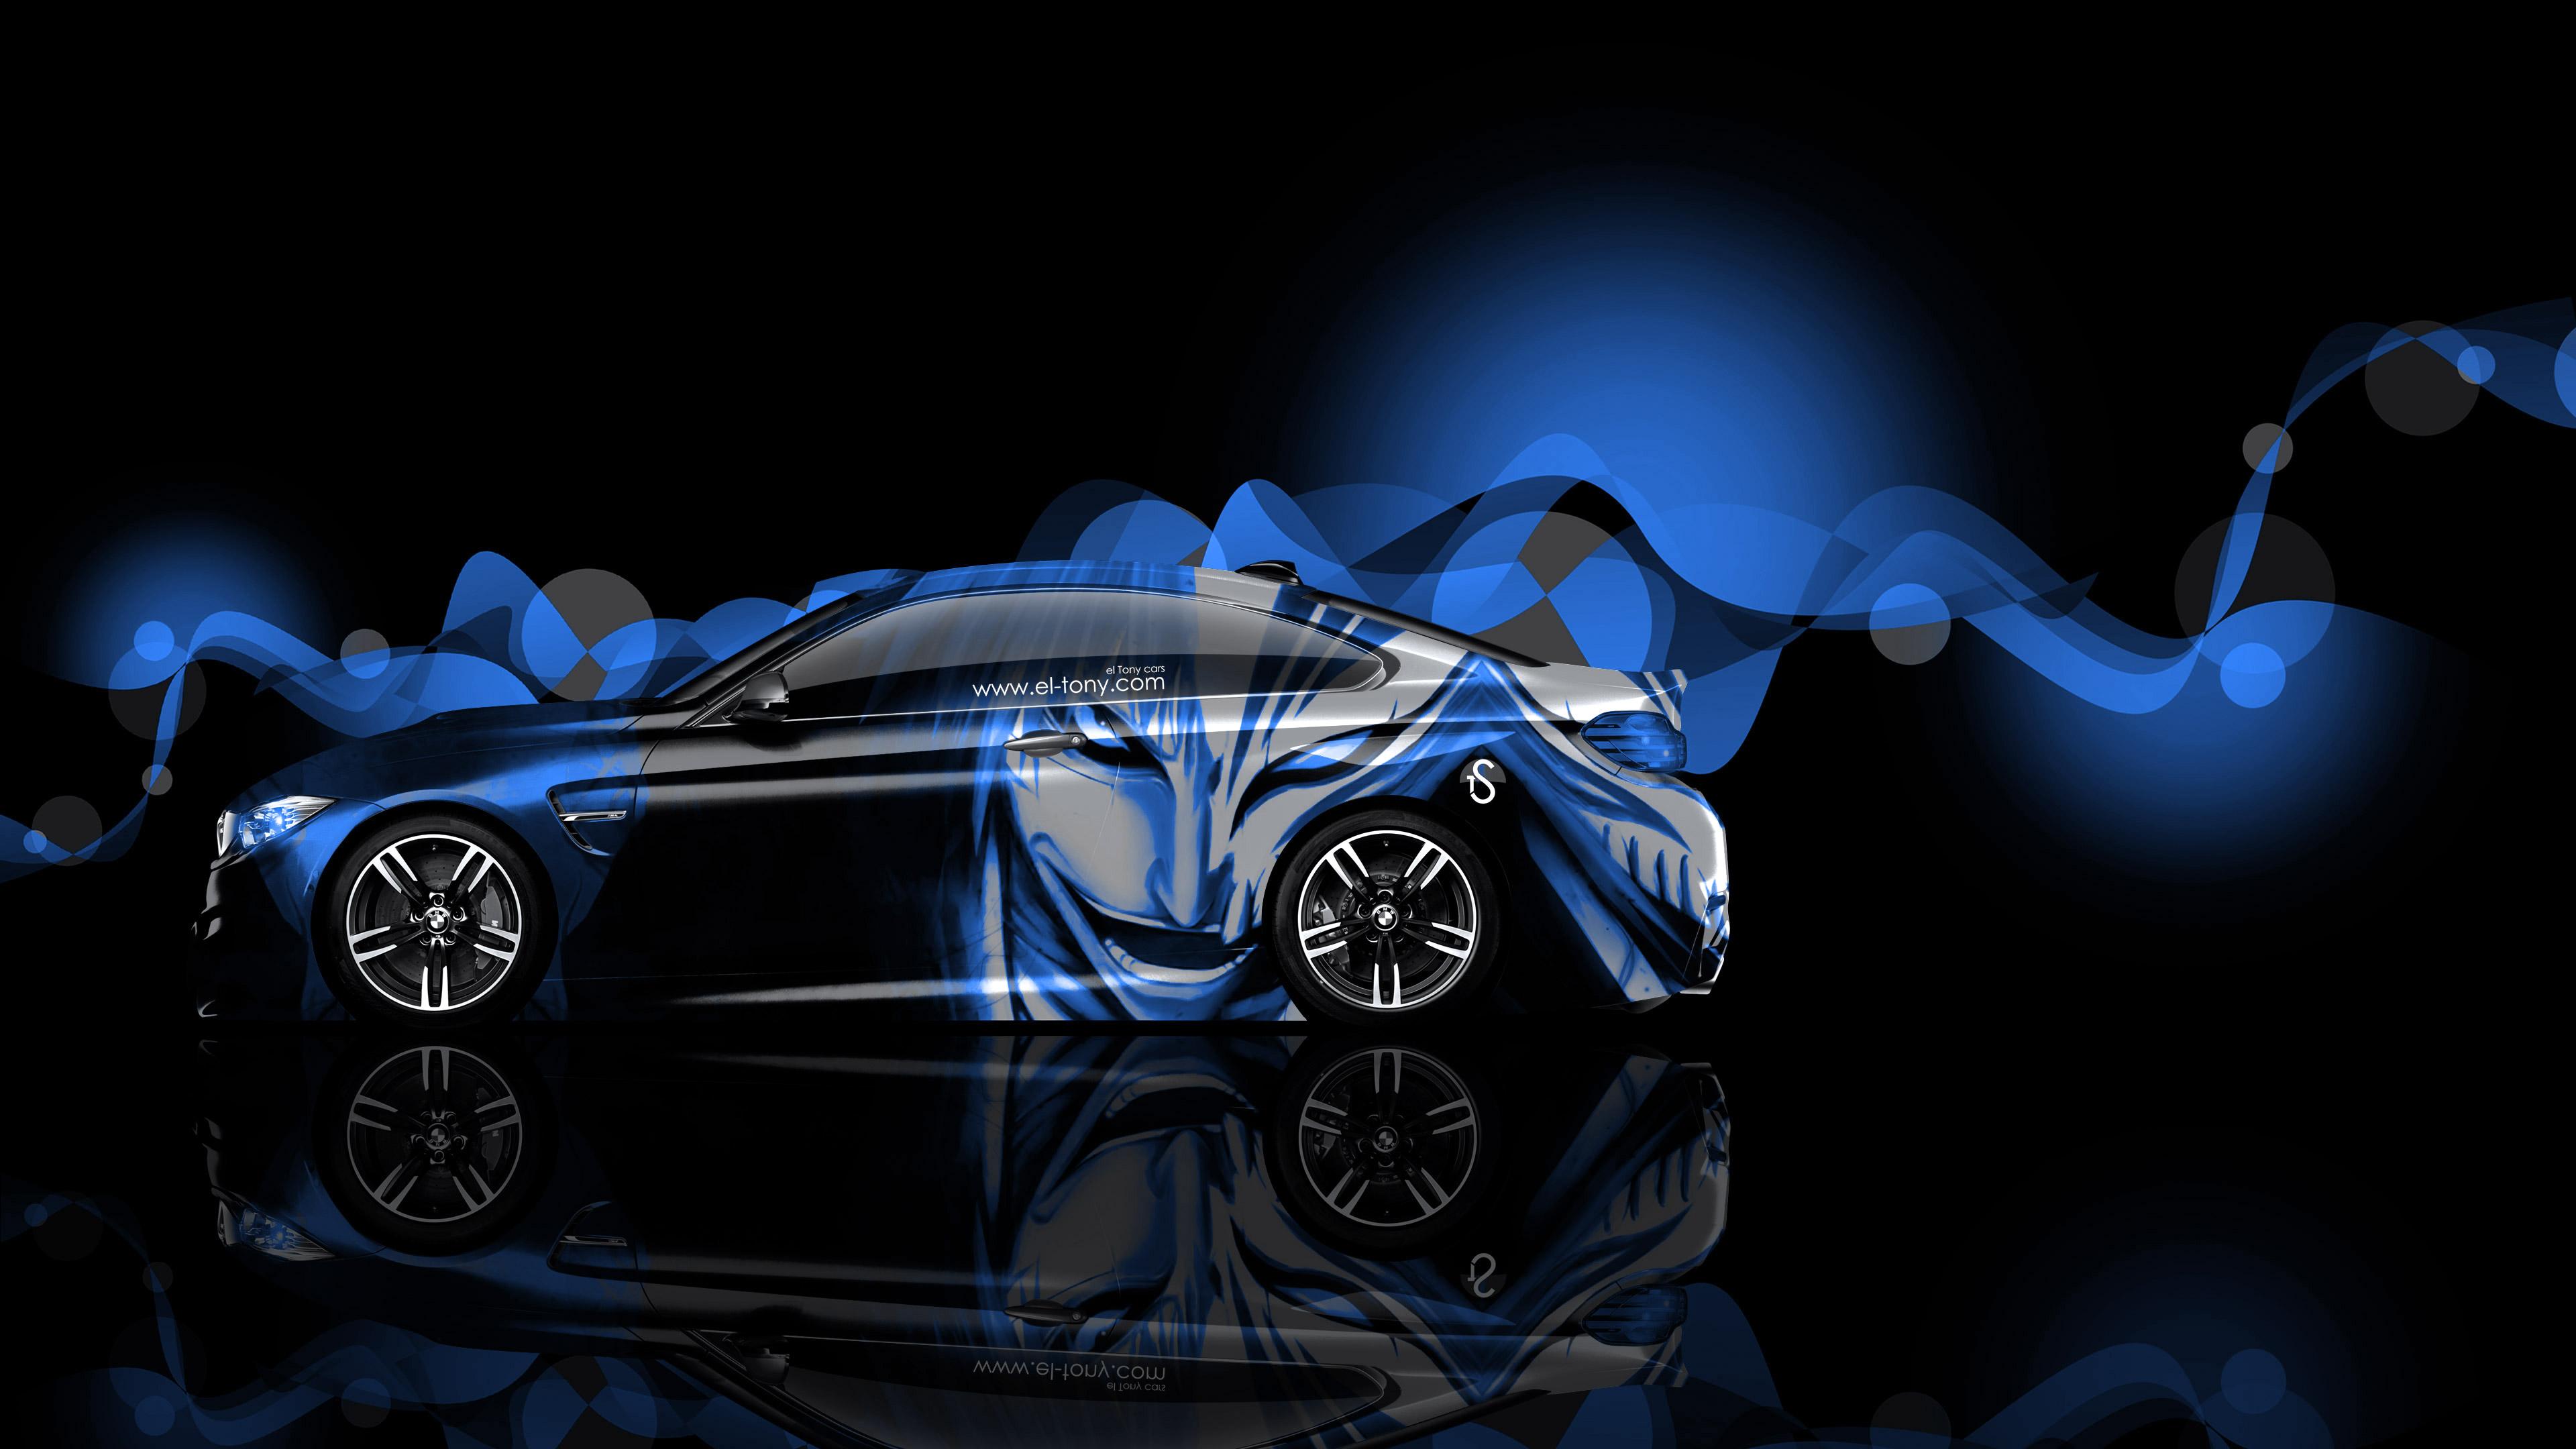 download 4K BMW M4 Coupe Side Anime Aerography Car 2014 el 3840x2160